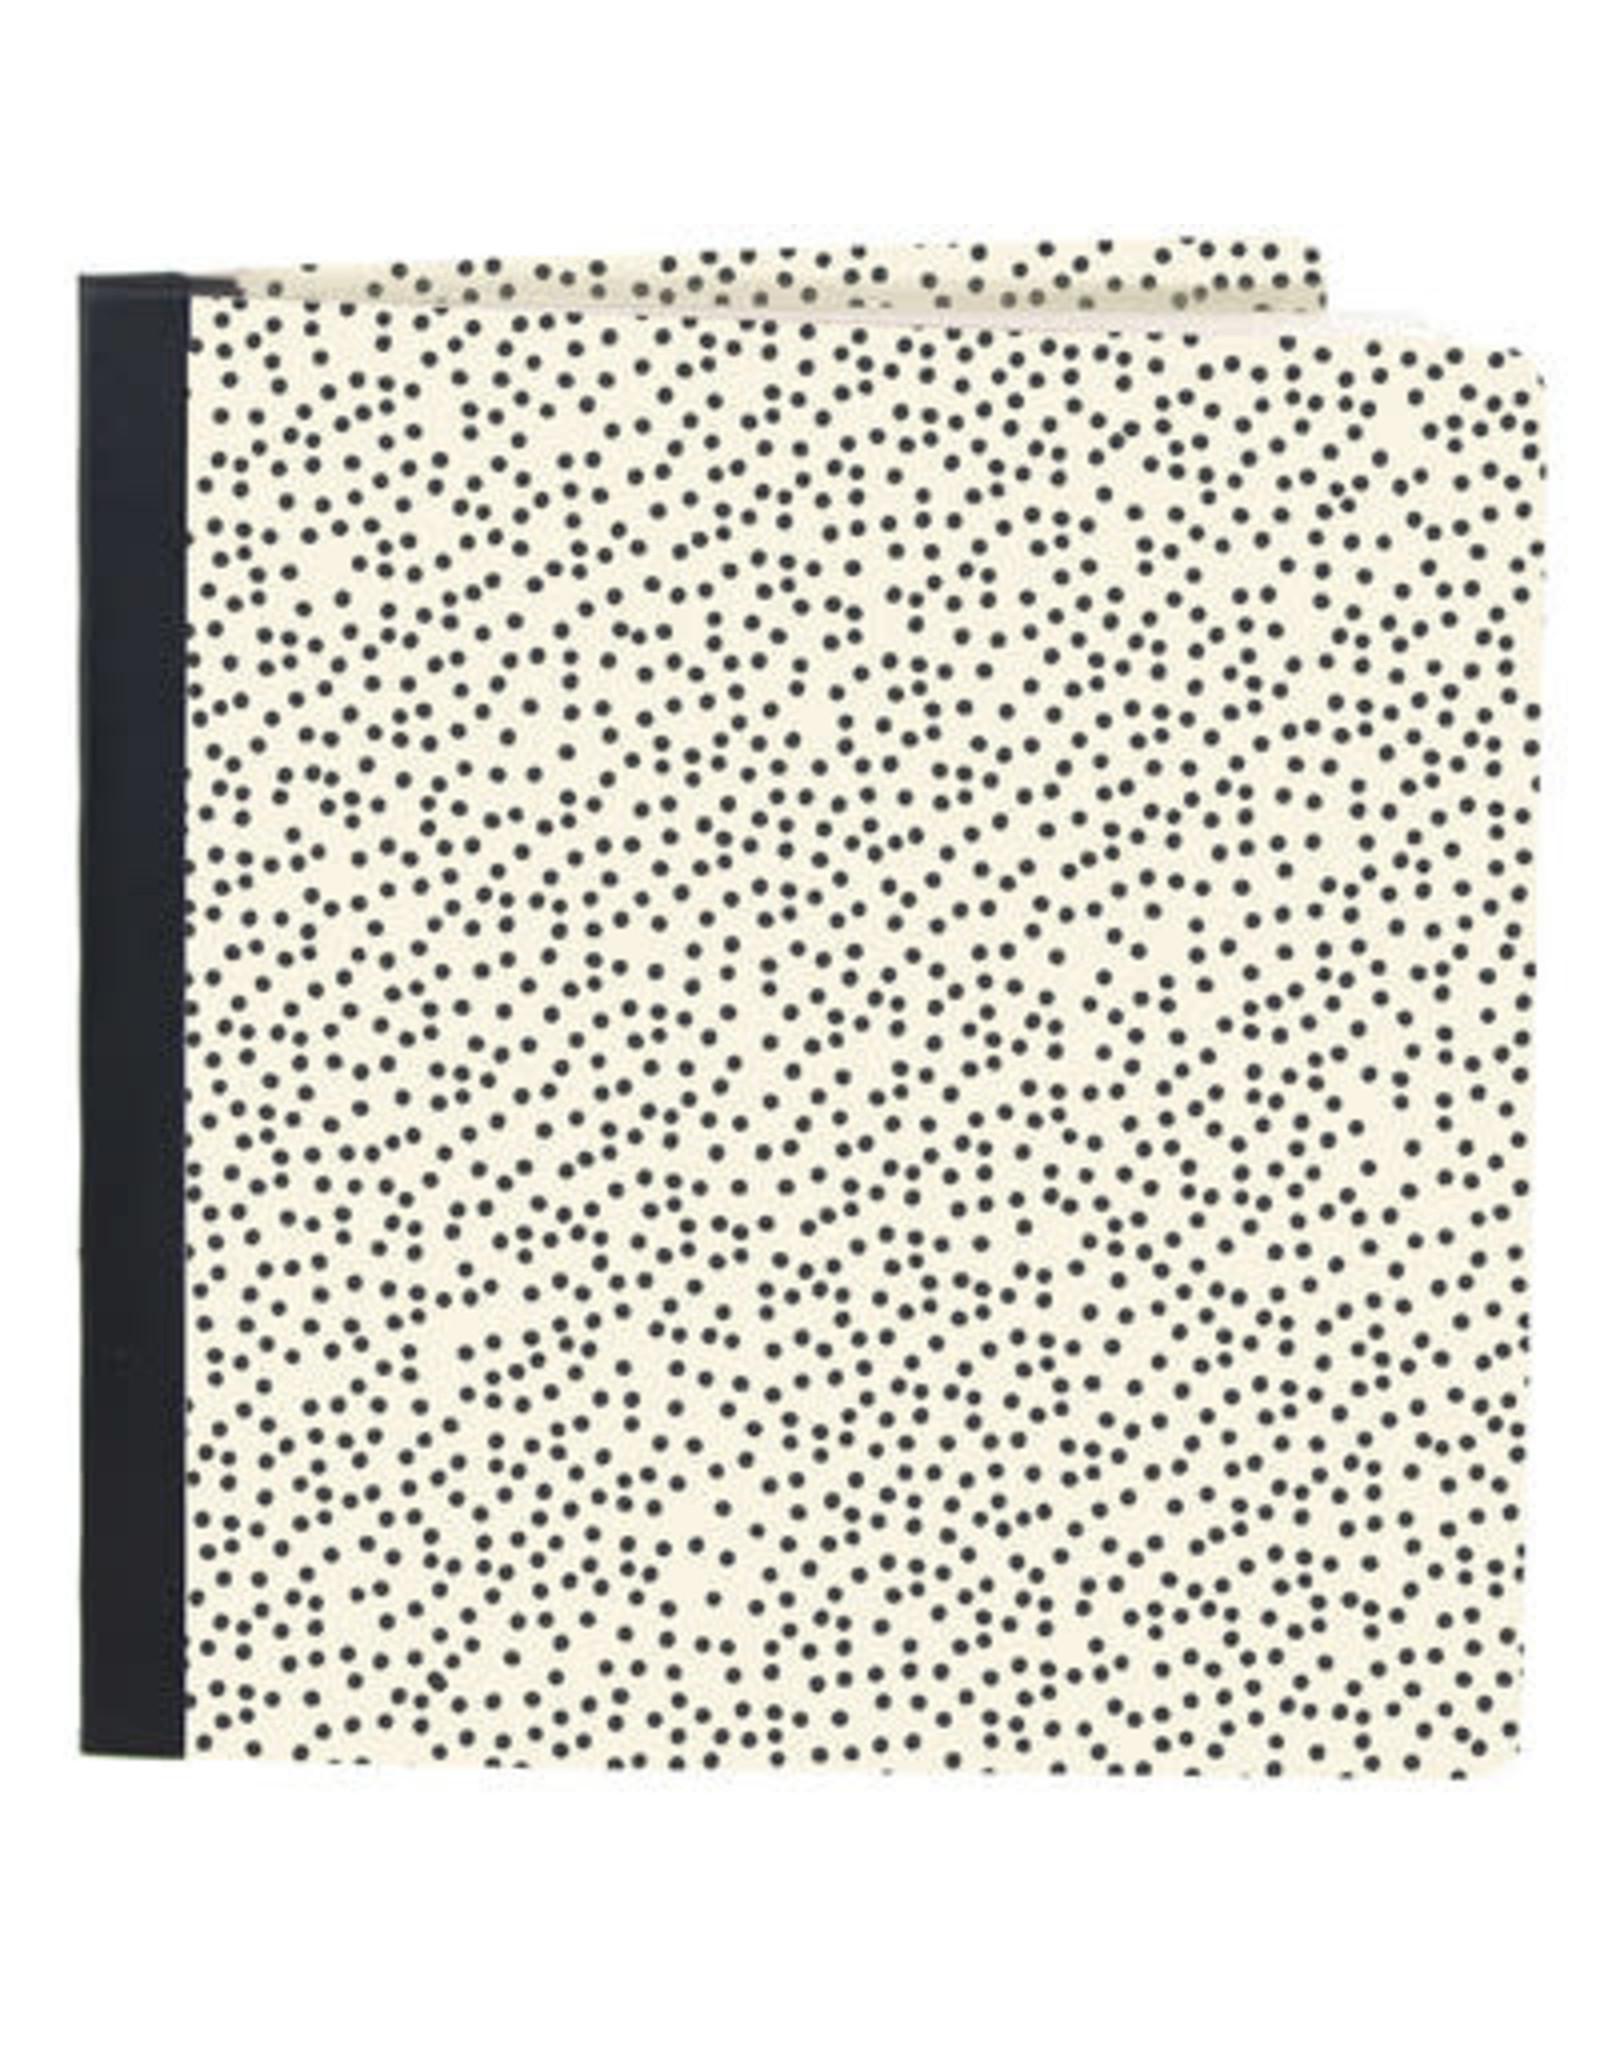 Simple Stories 6x8 SN@P Flipbook - Speckle Dots